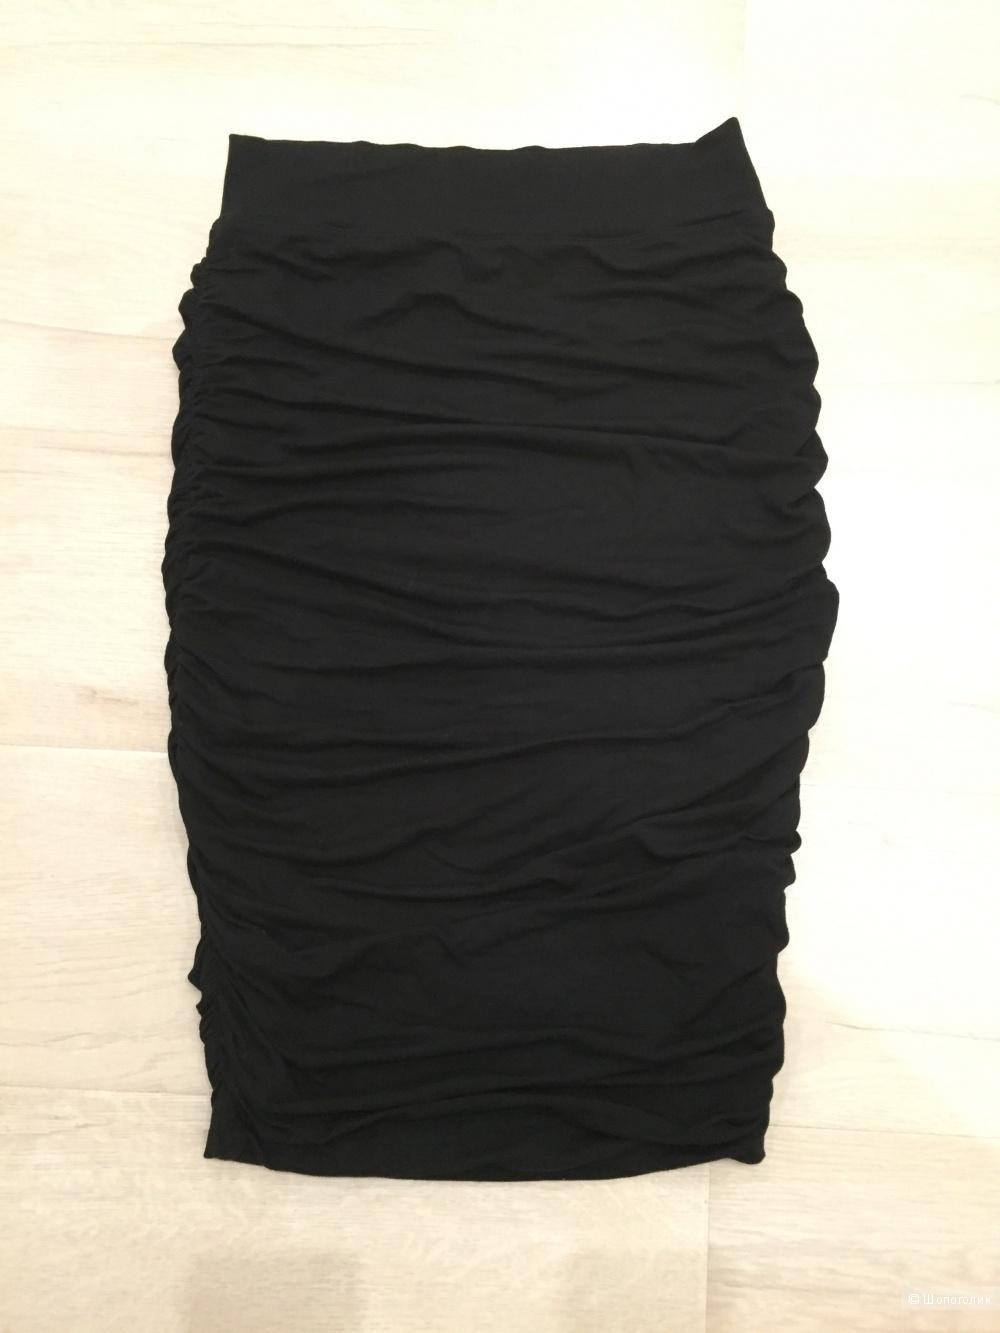 Юбка черная Moda International xs